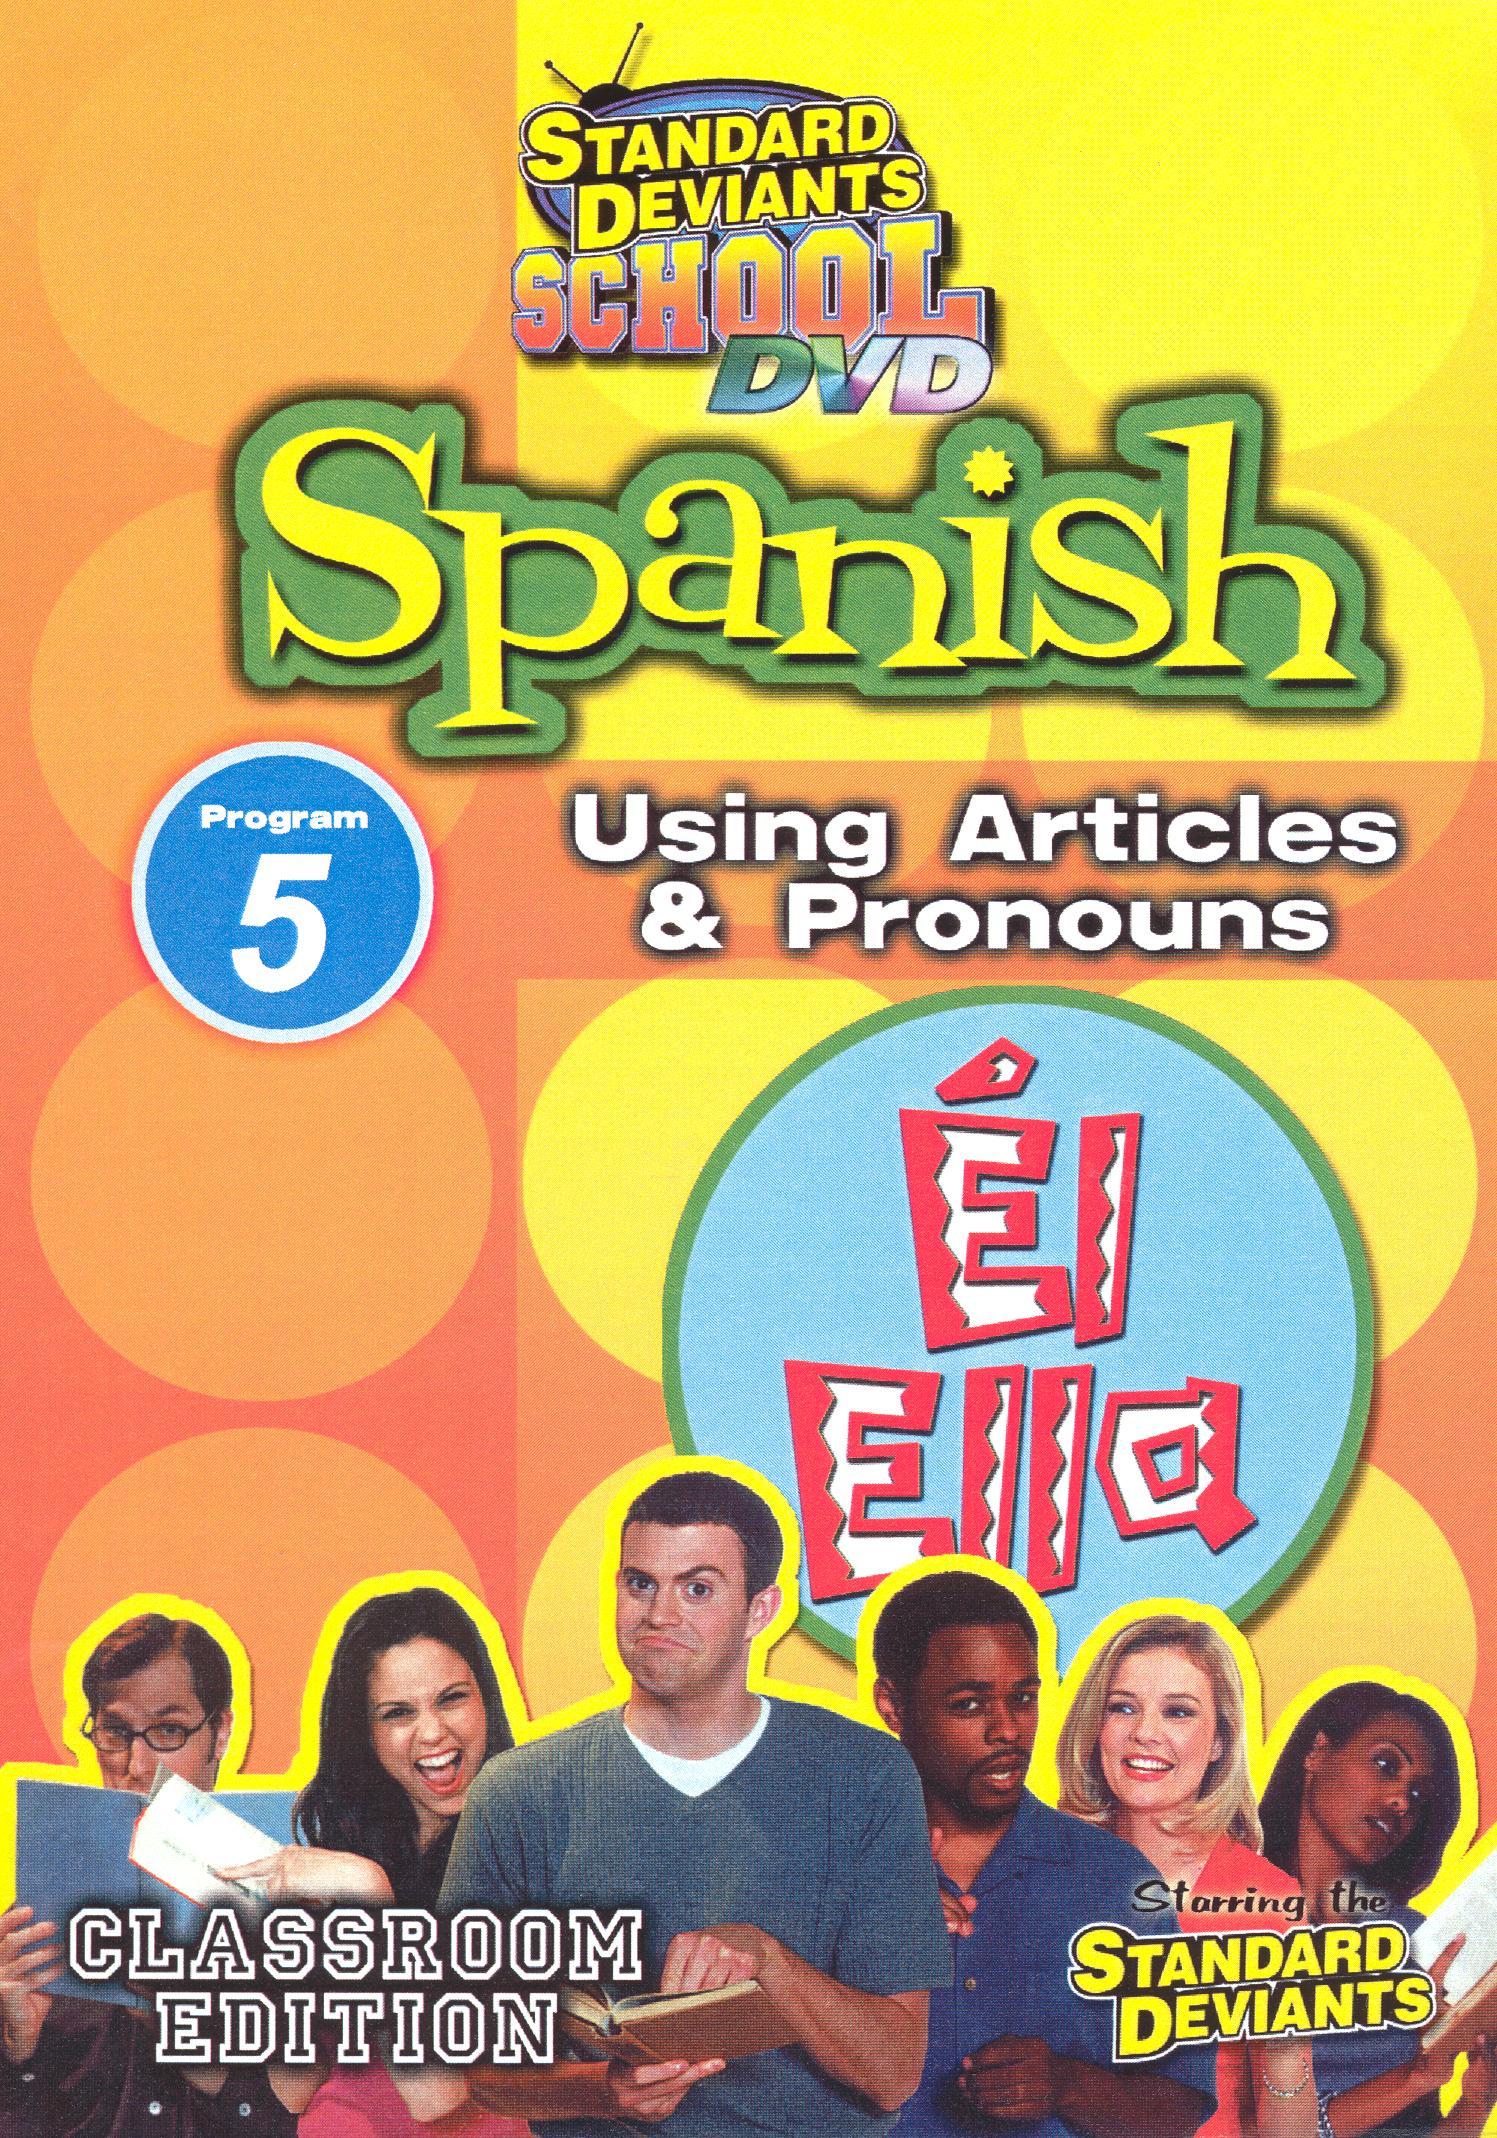 Standard Deviants School: Spanish, Program 5